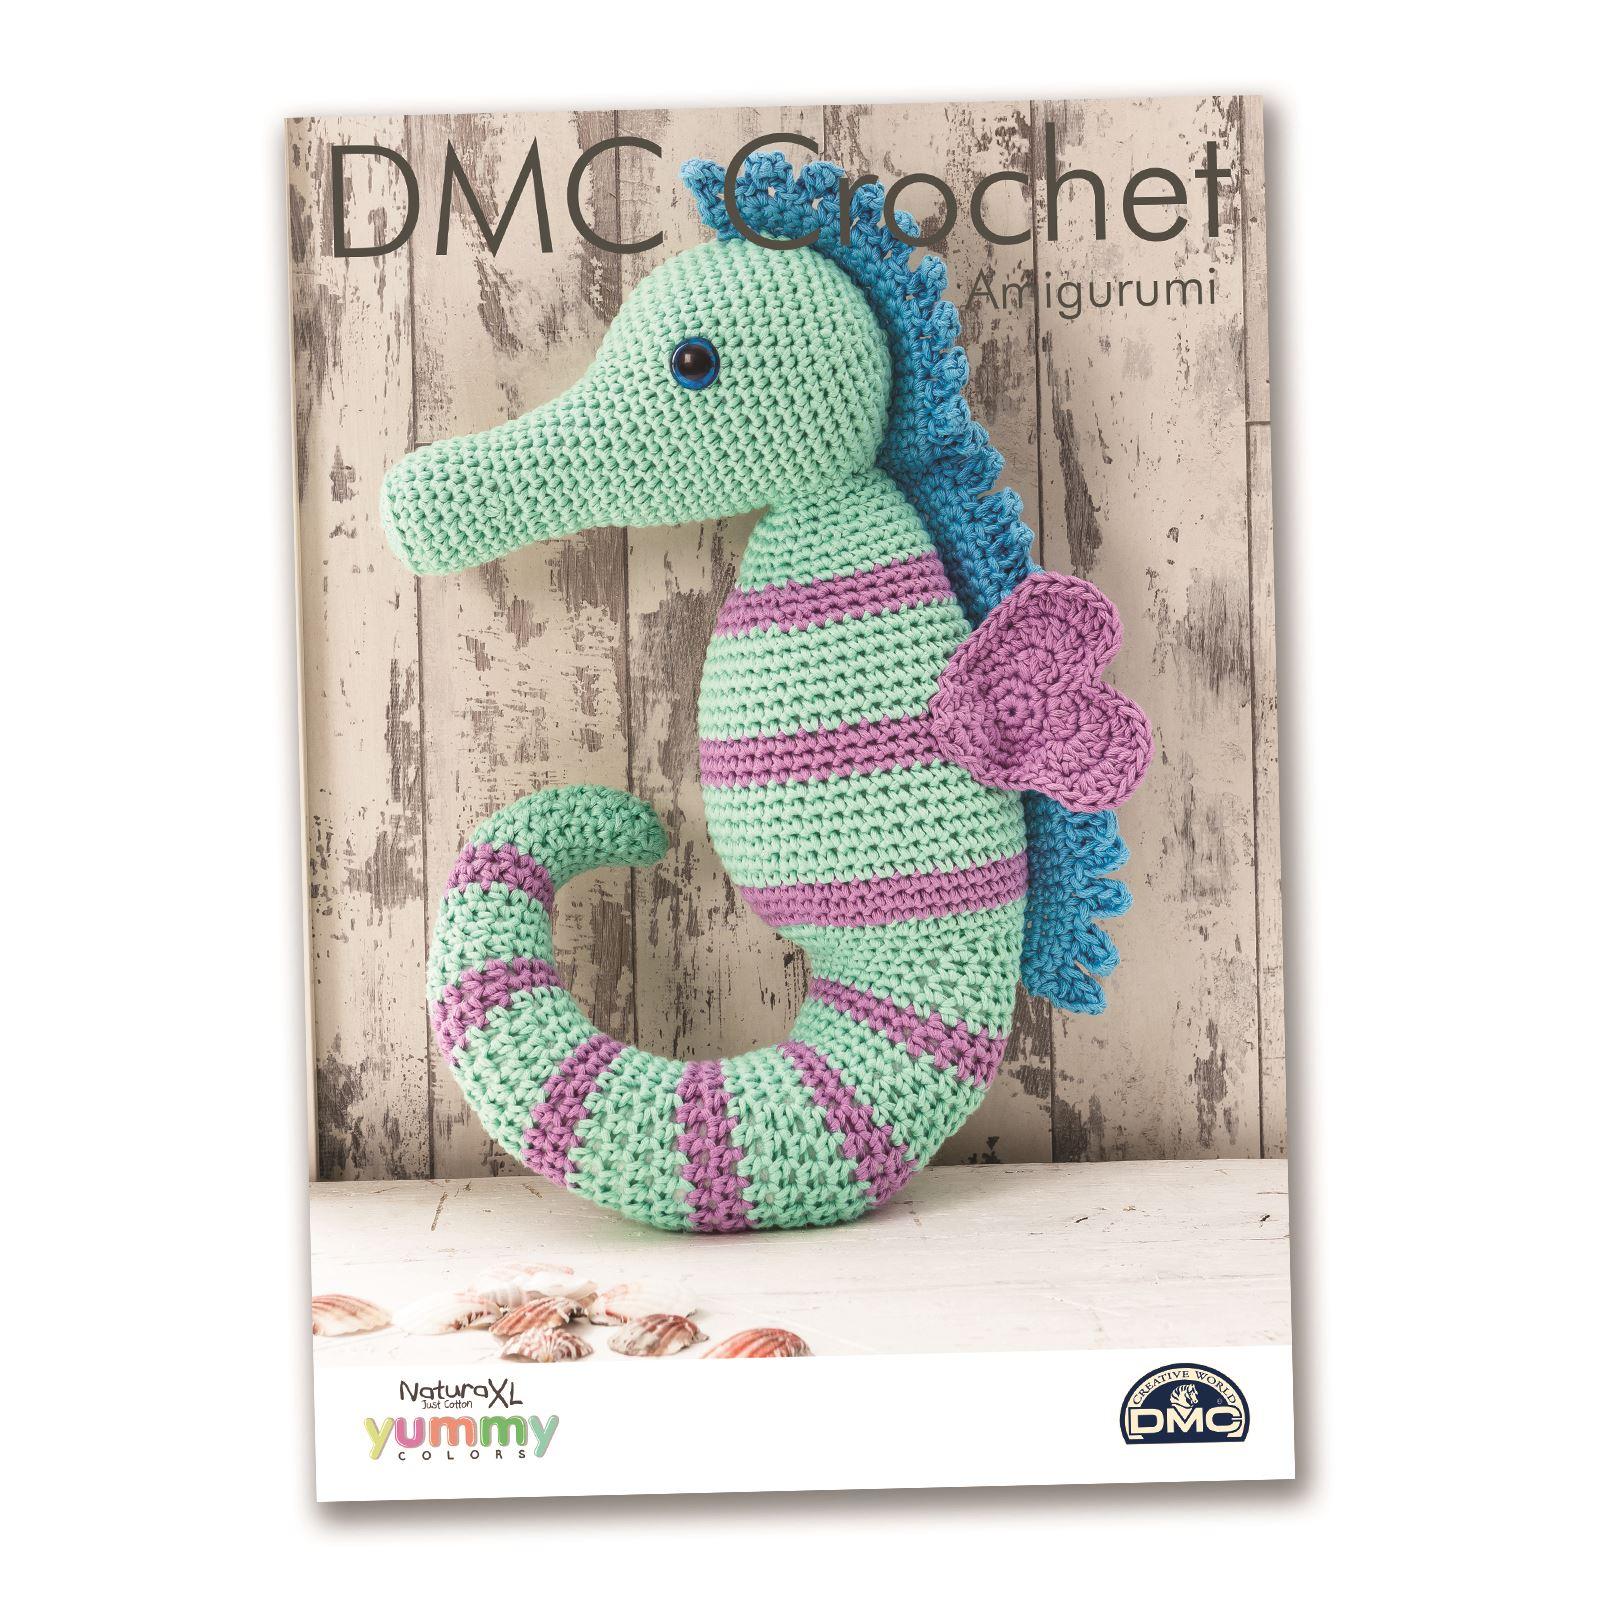 DMC Natura XL Yummy Crochet Patterns Amigurumi Home Decor eBay